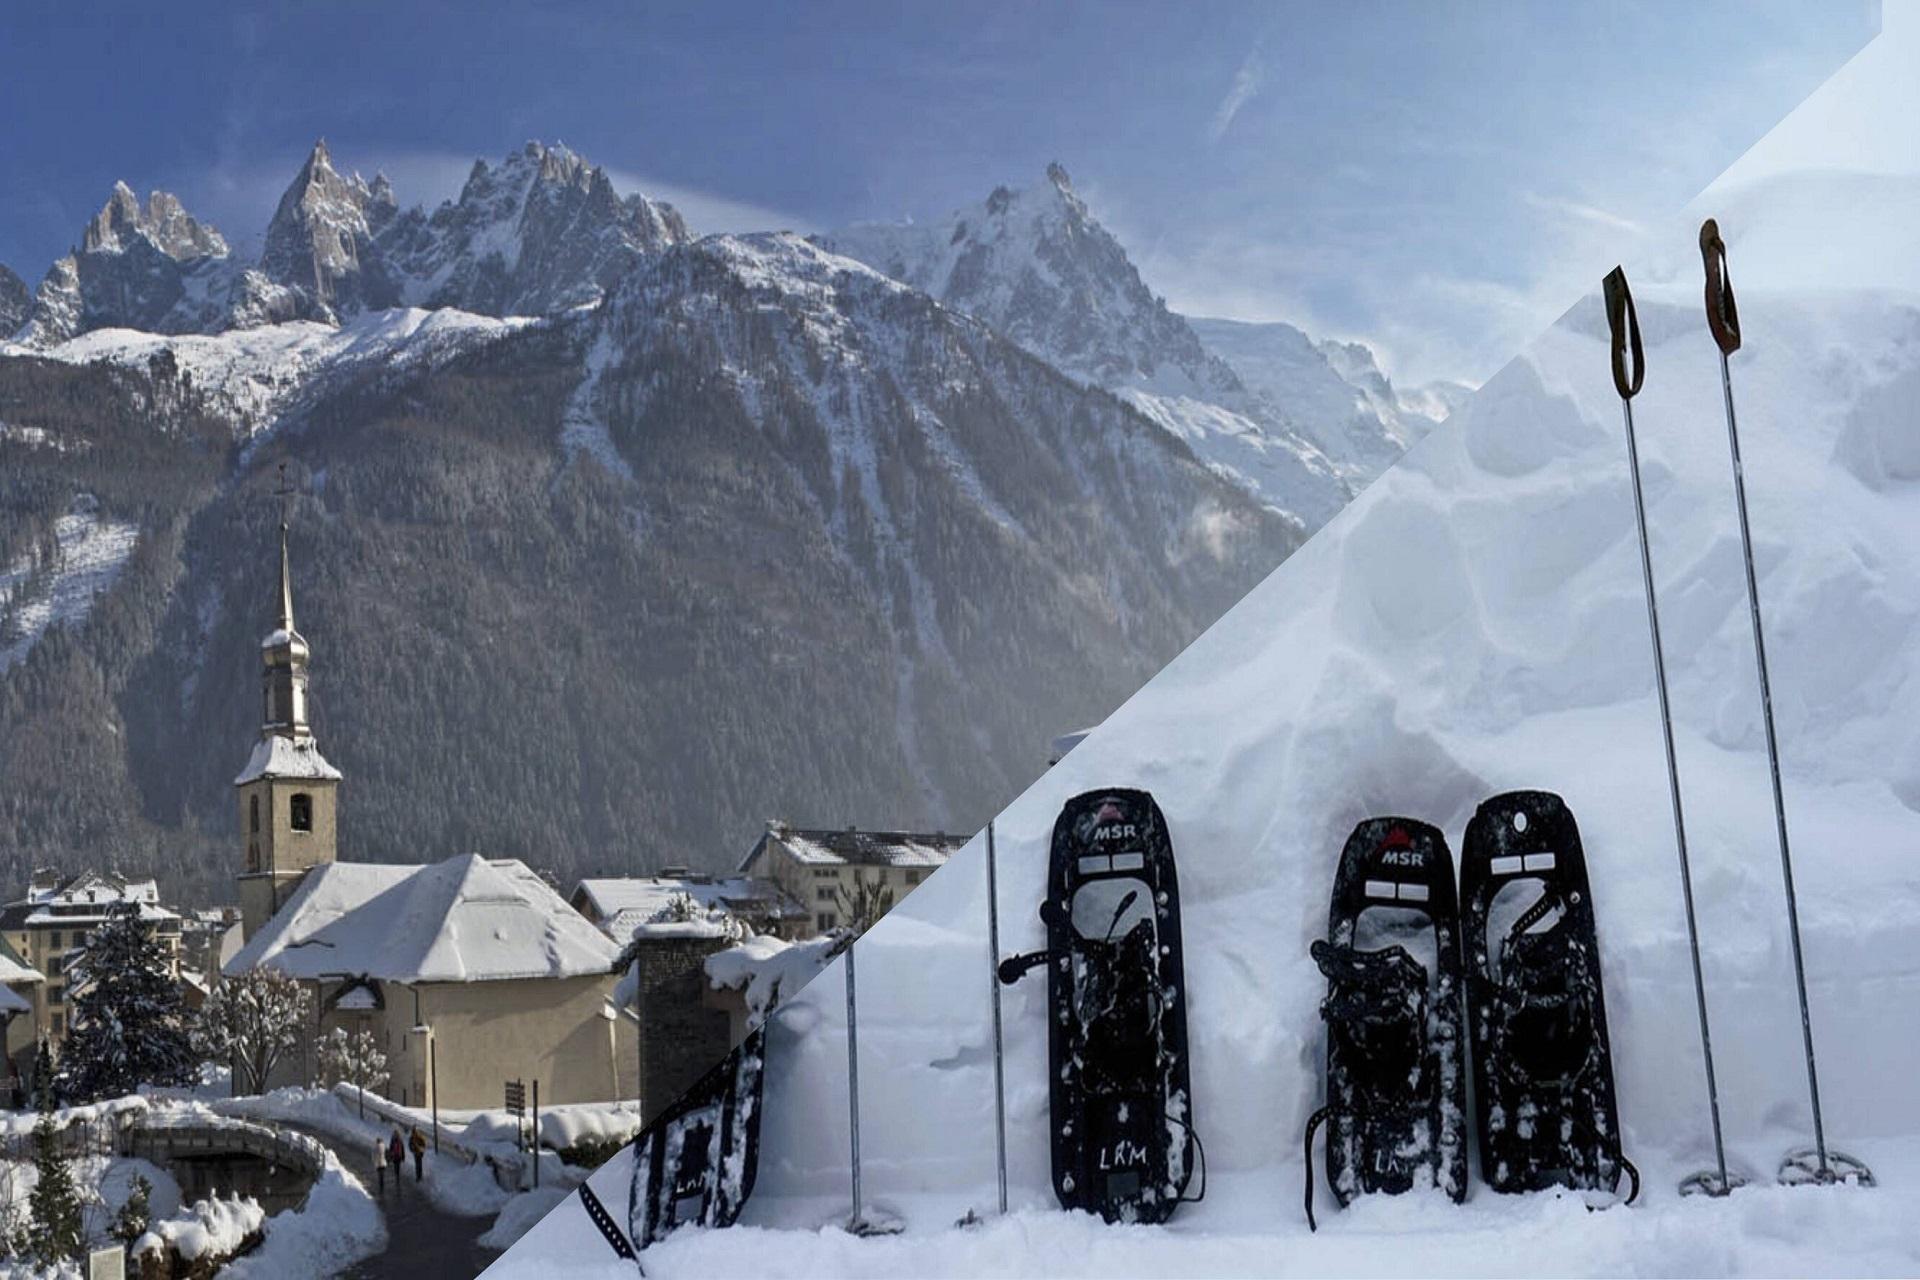 la-folie-douce-hotel-skis-chamonix-mont-blanc